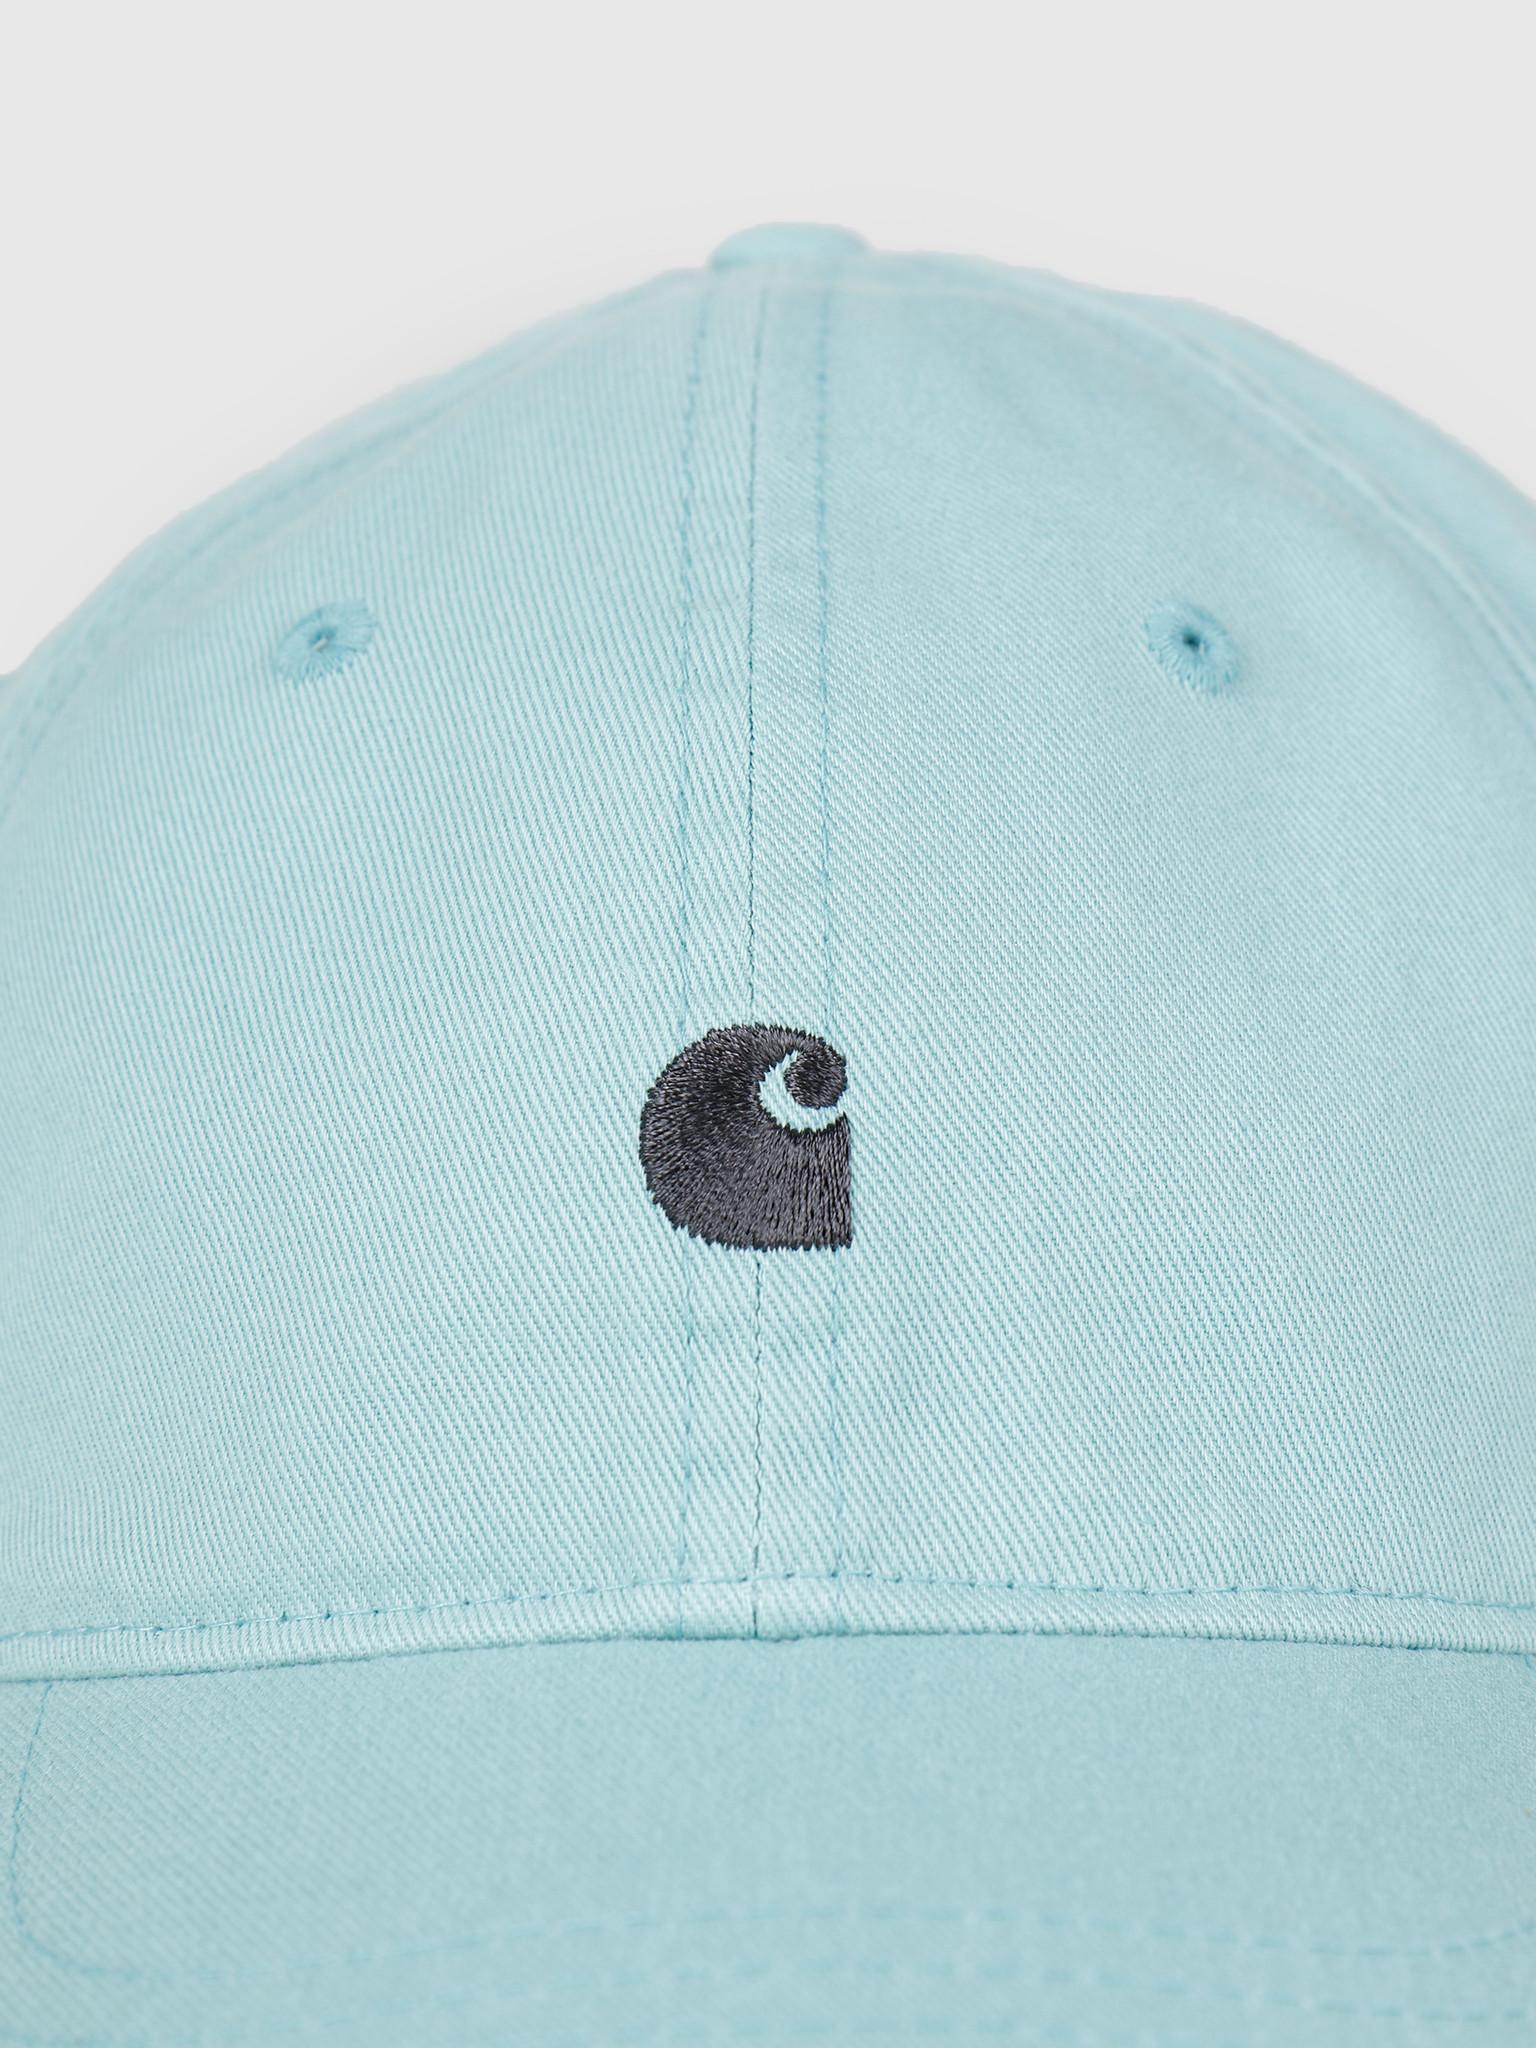 Carhartt WIP Carhartt WIP Madison Logo Cap Soft Aloe Dark Navy 65050030